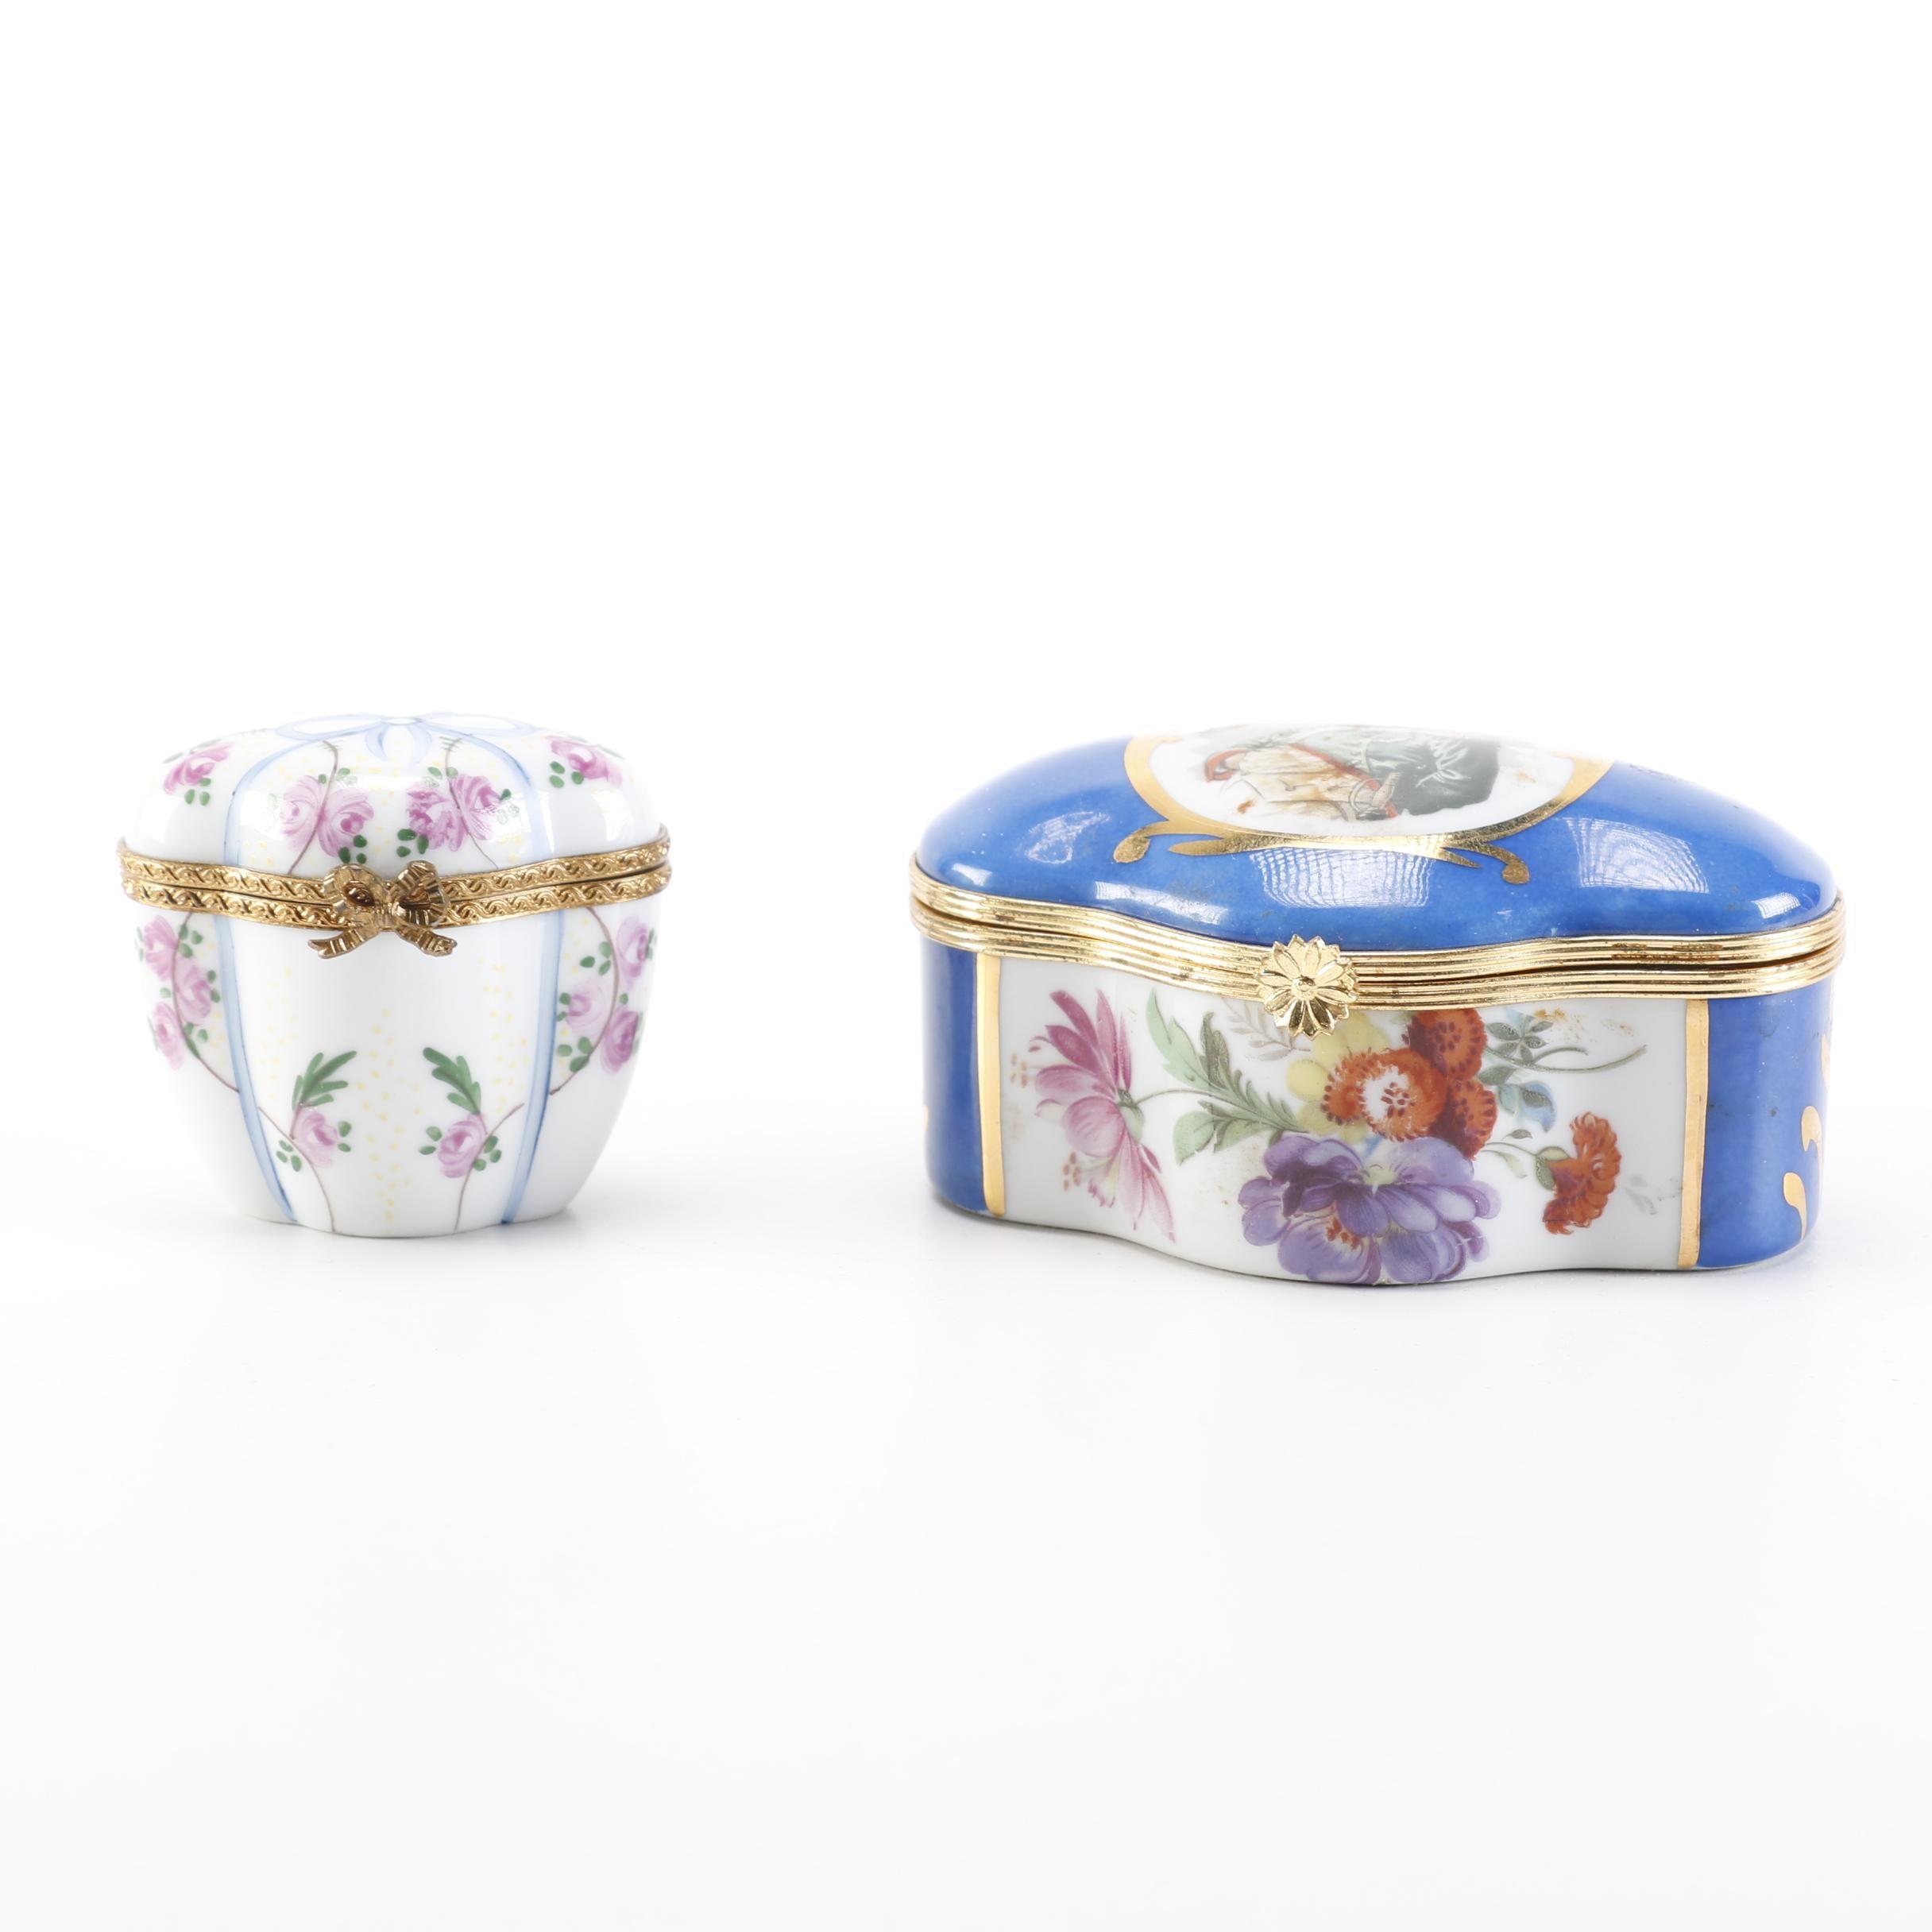 Pair of Limoges Porcelain Trinket Boxes